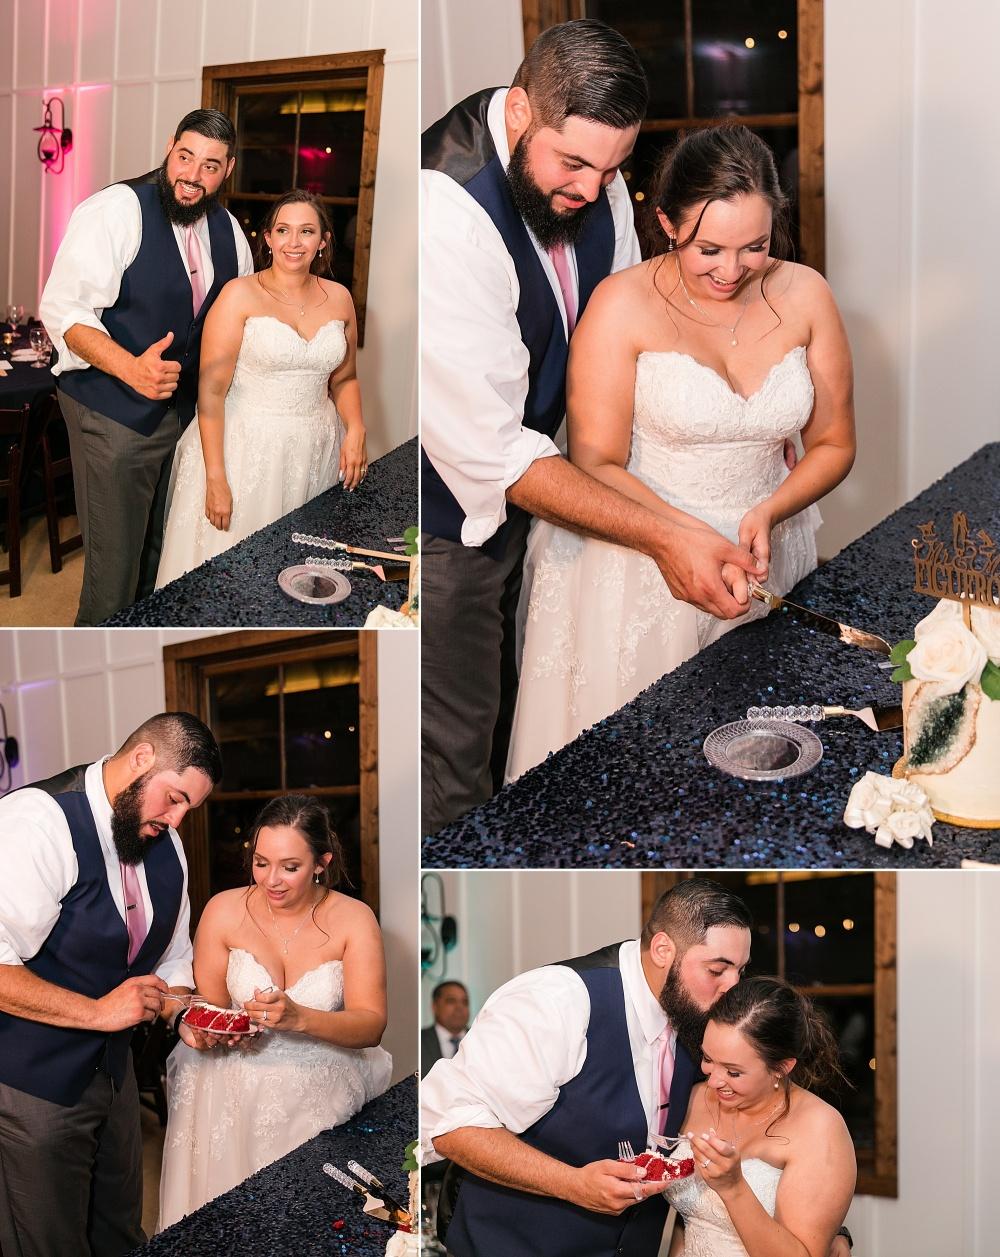 Wedding-Photographer-Bulverde-Texas-Western-Sky-Event-Venue-Carly-Barton-Photography_0080.jpg